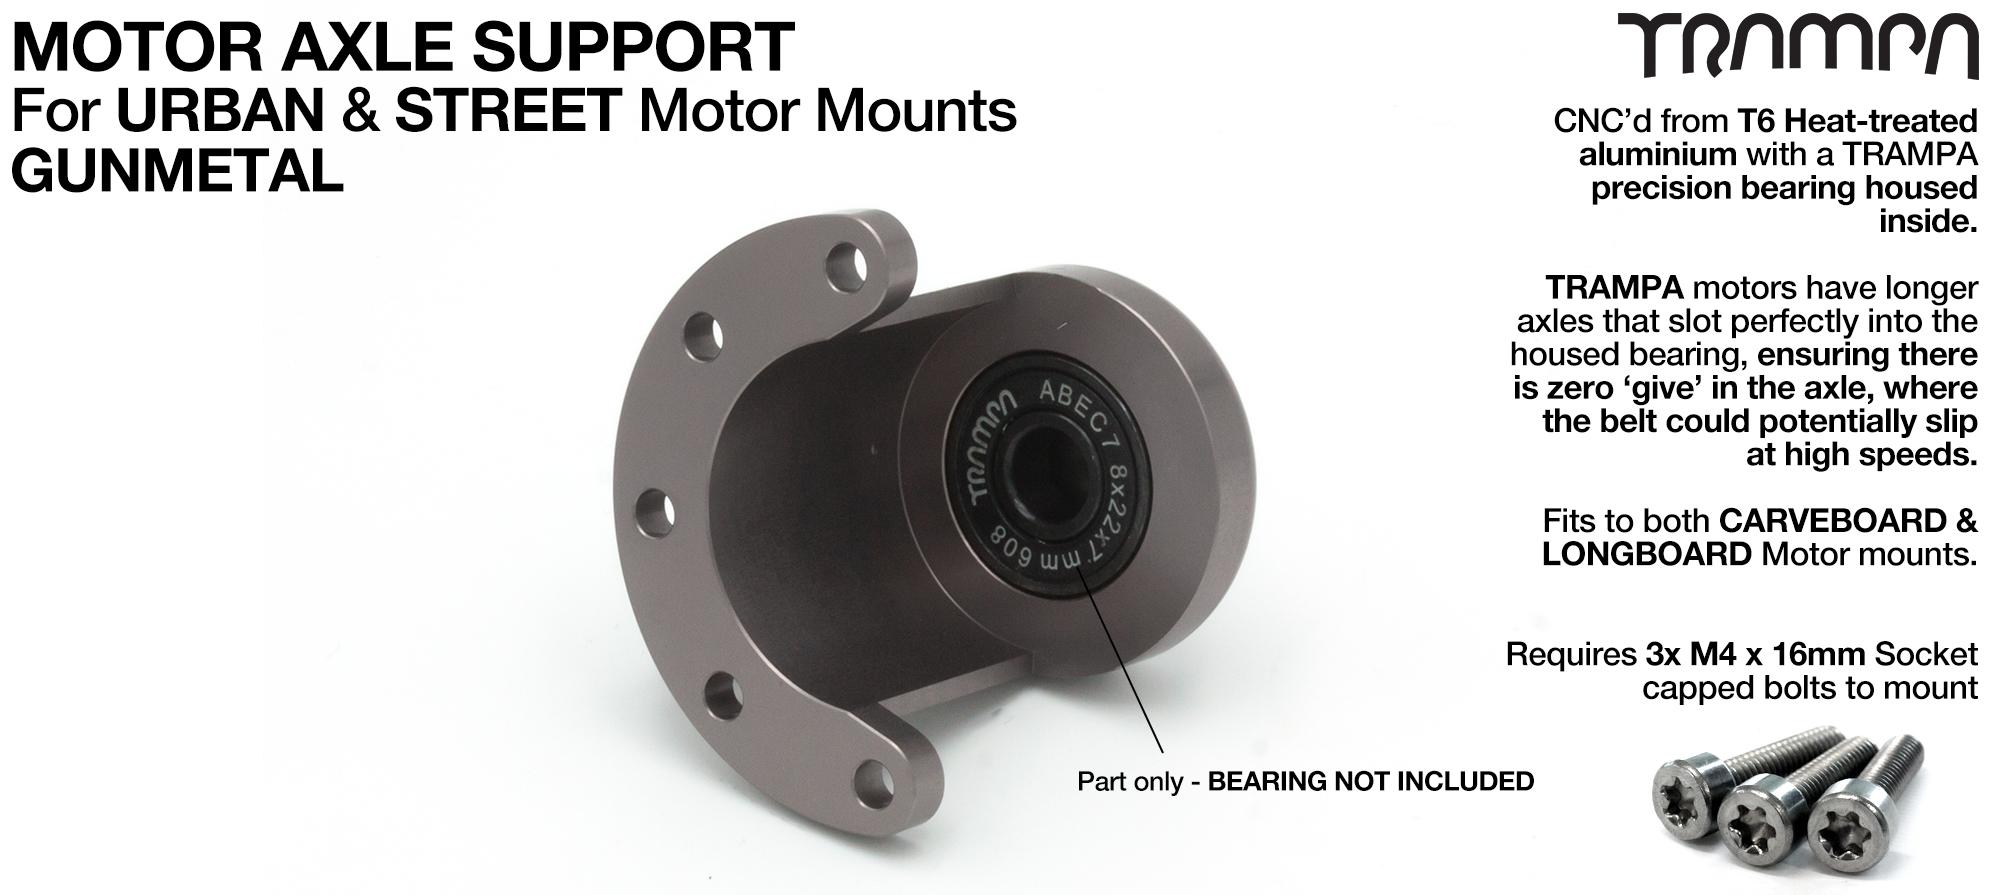 Motor Axle Support for Spring Truck Motor Mounts UNIVERSAL - GUNMETAL